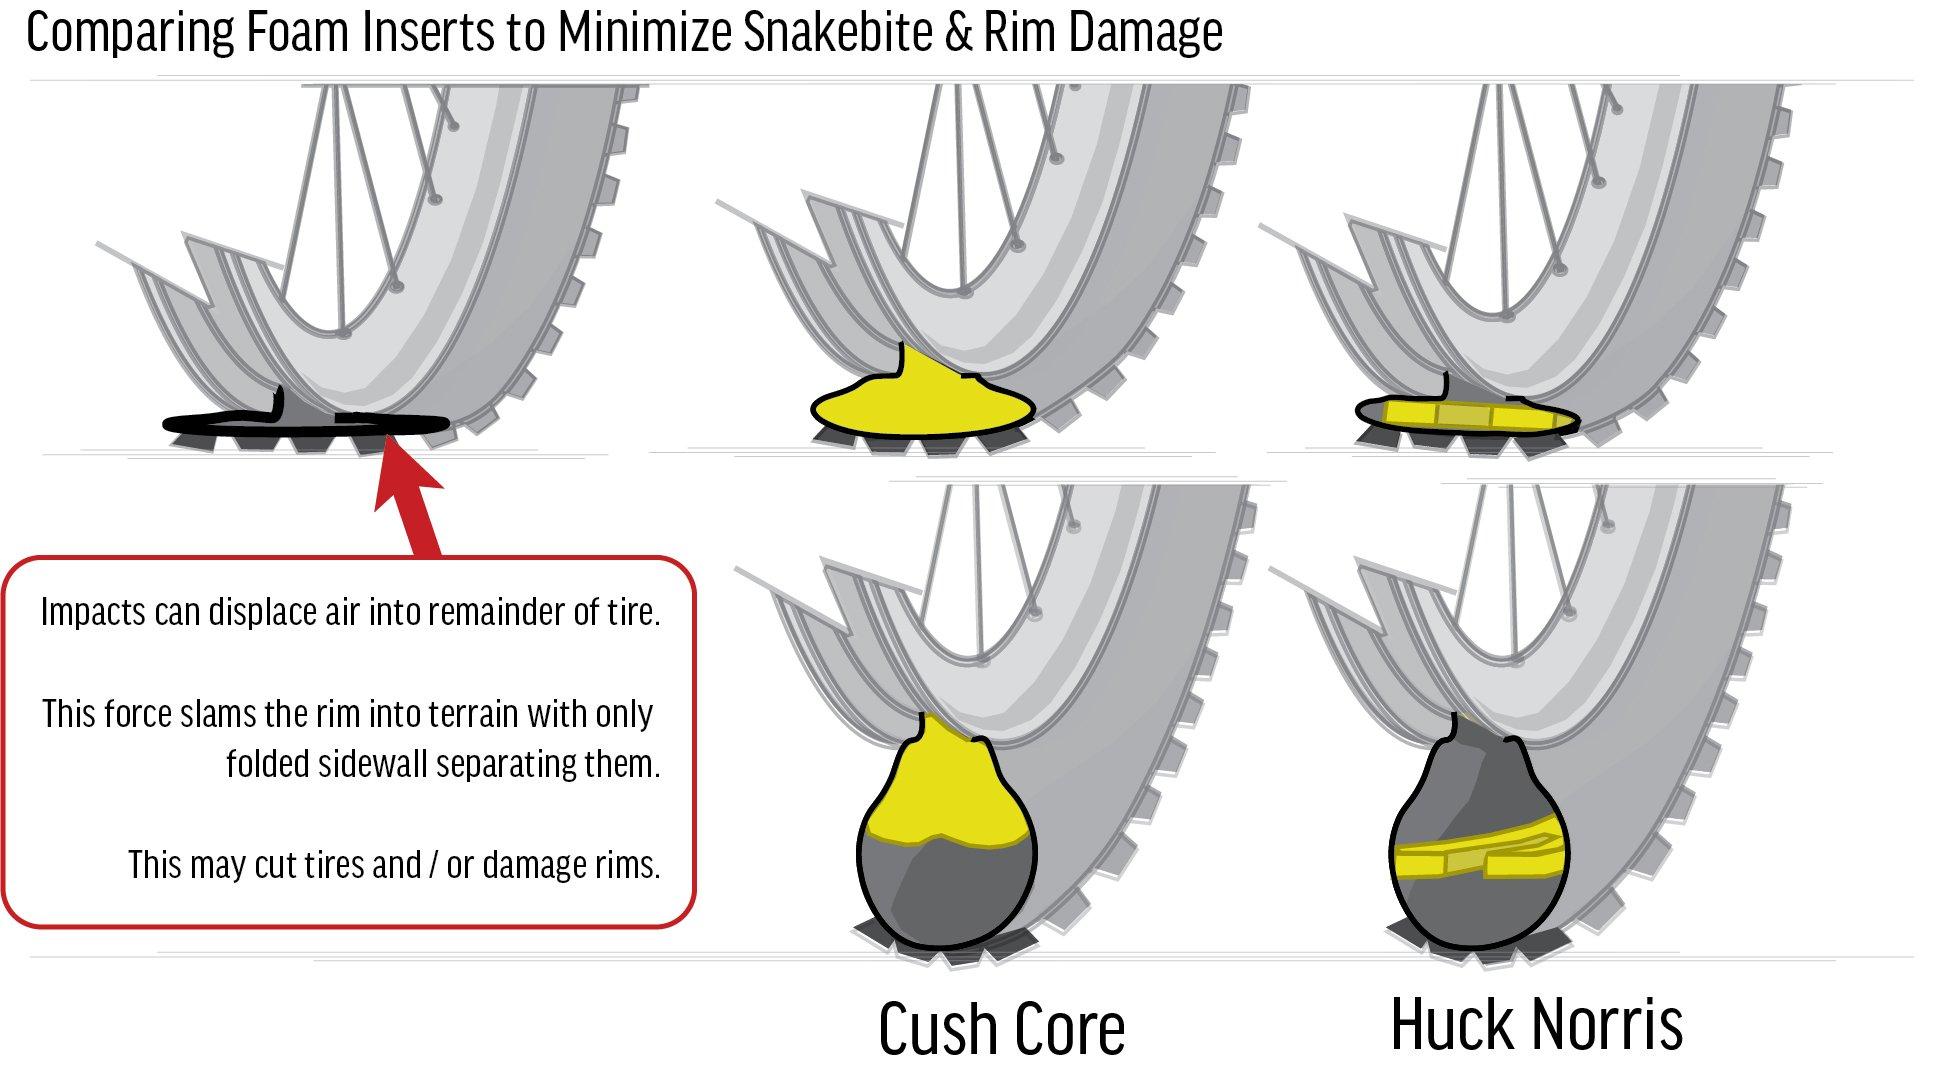 Cush Core Huck Norris Comparison